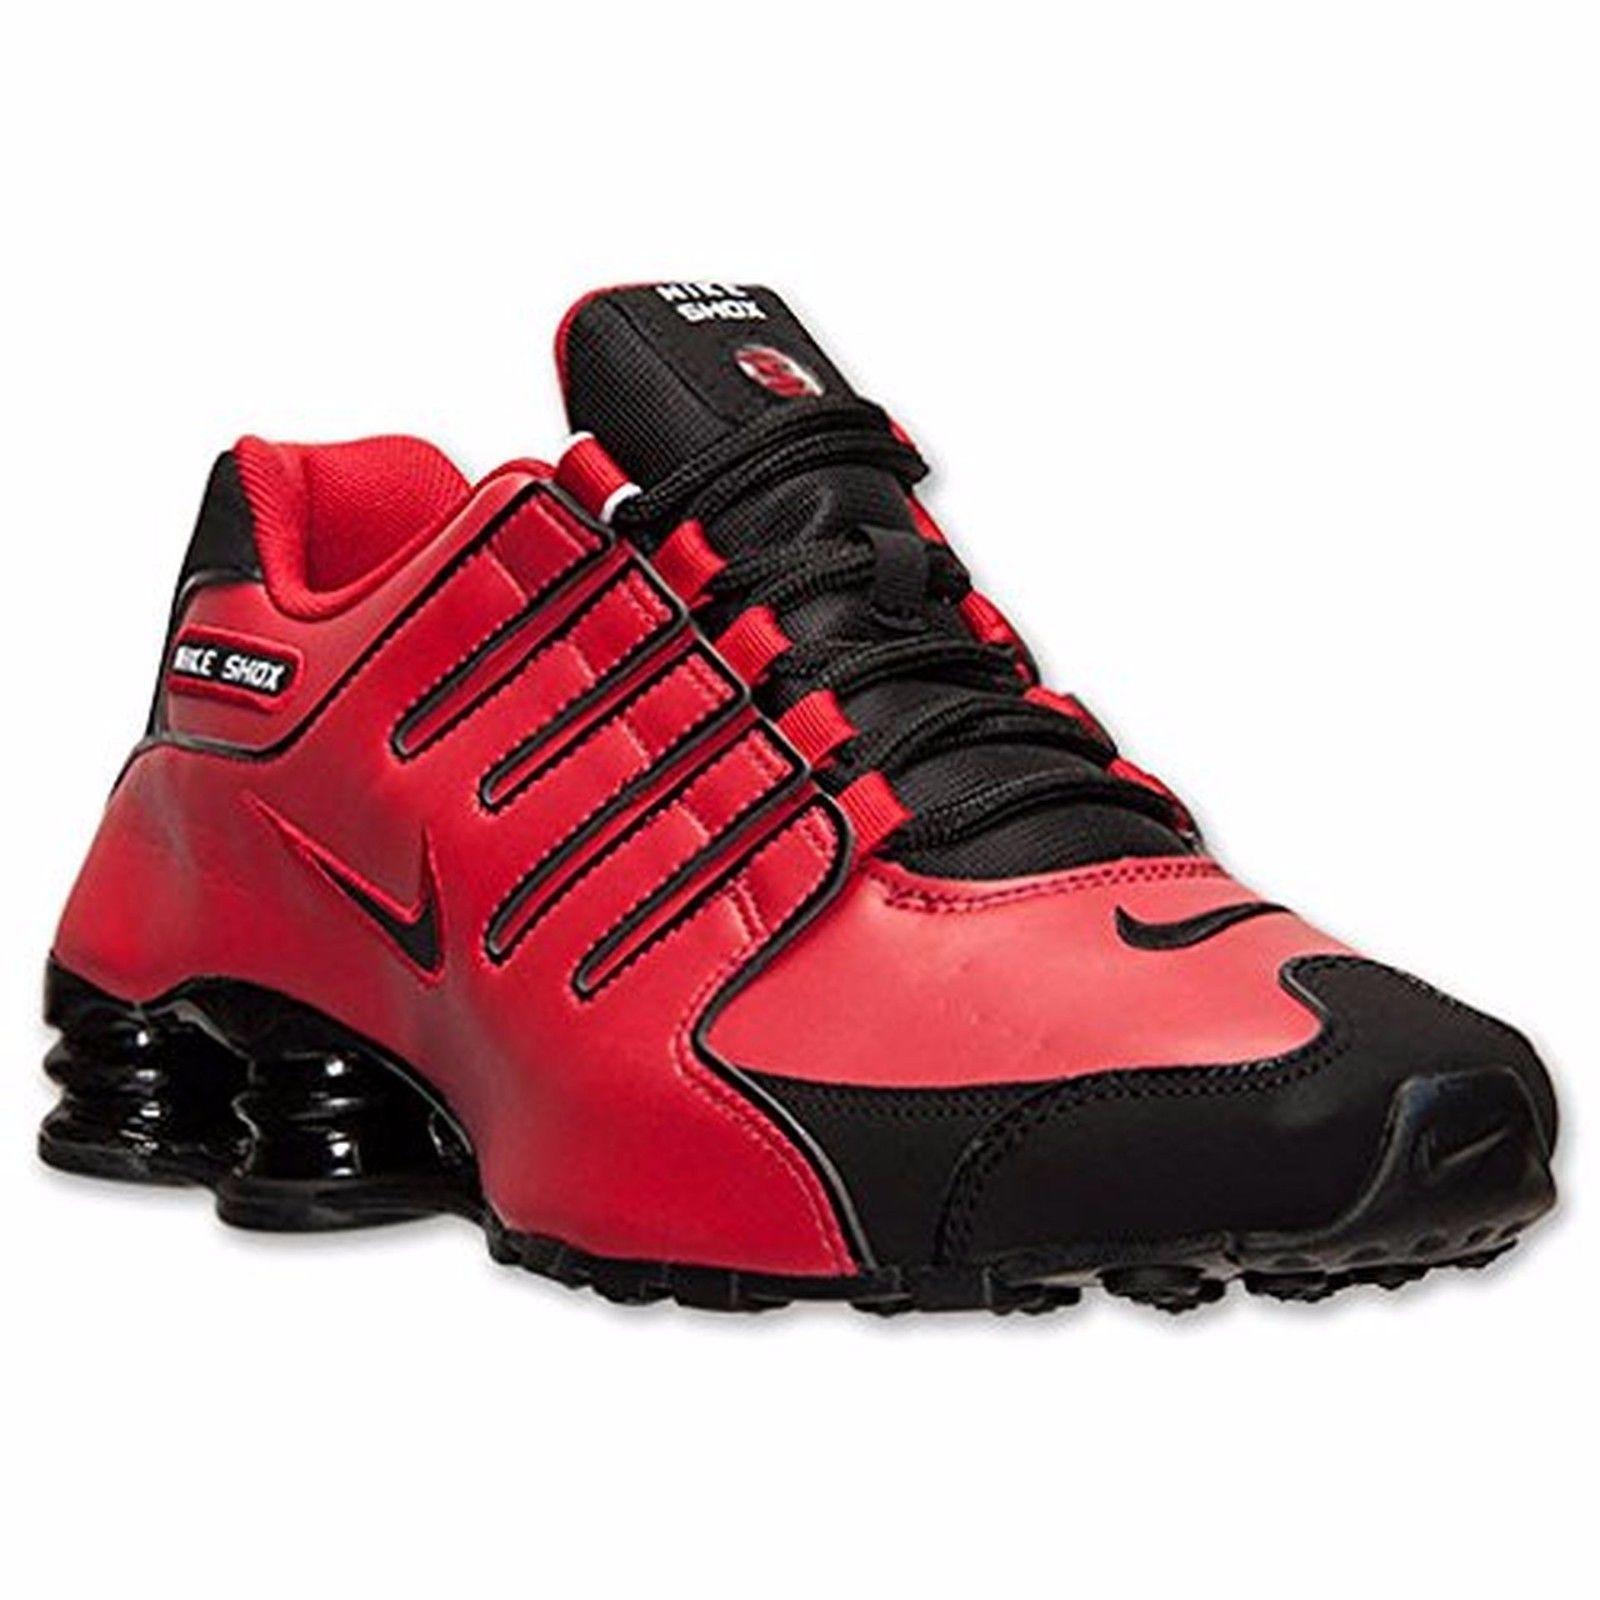 Nike Shox NZ Shoe Mens size 8.5 378341 600 University Red